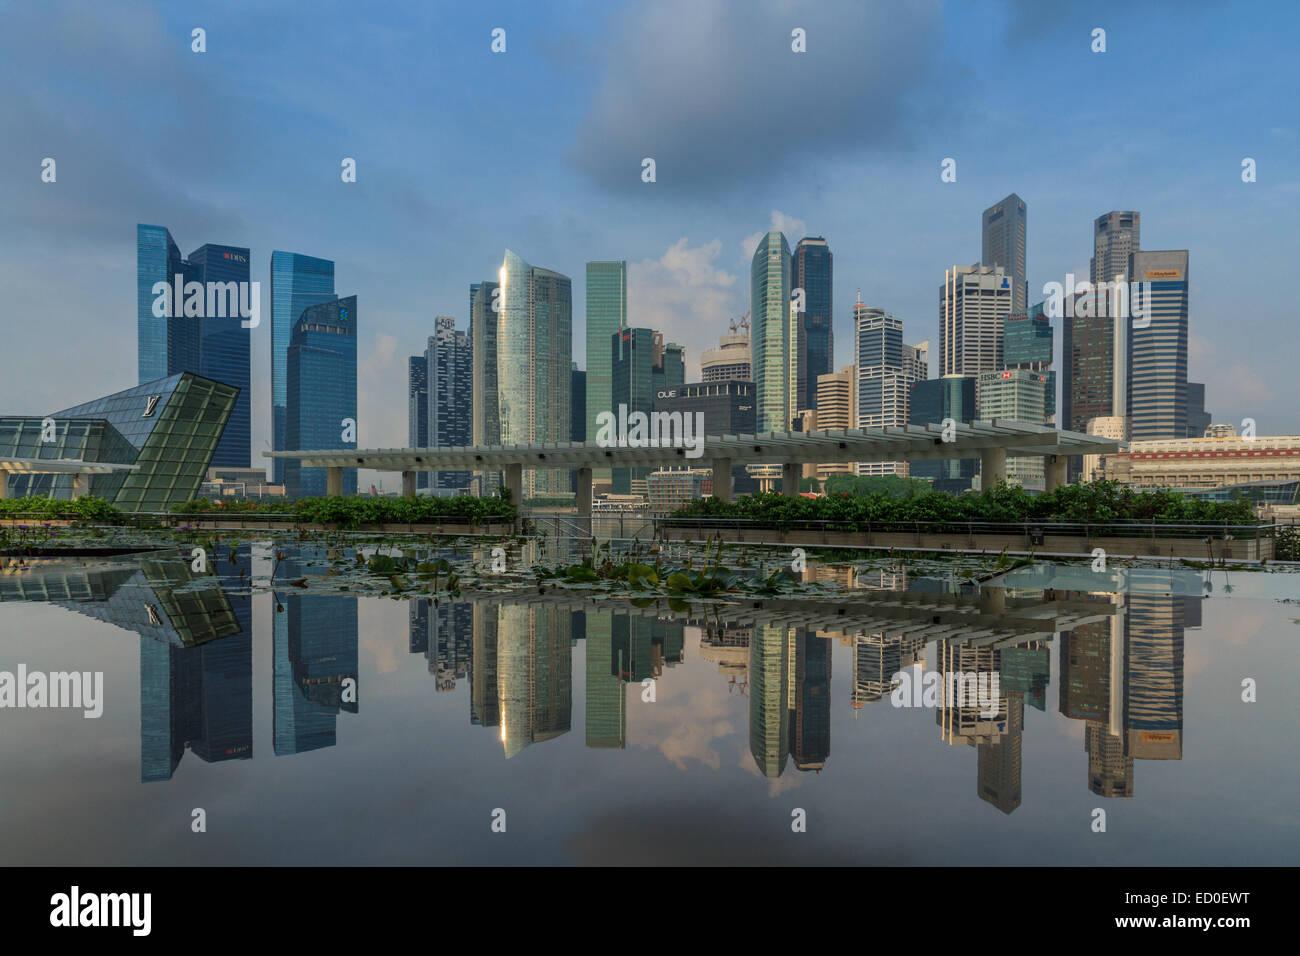 Singapore, Modern city skyline - Stock Image